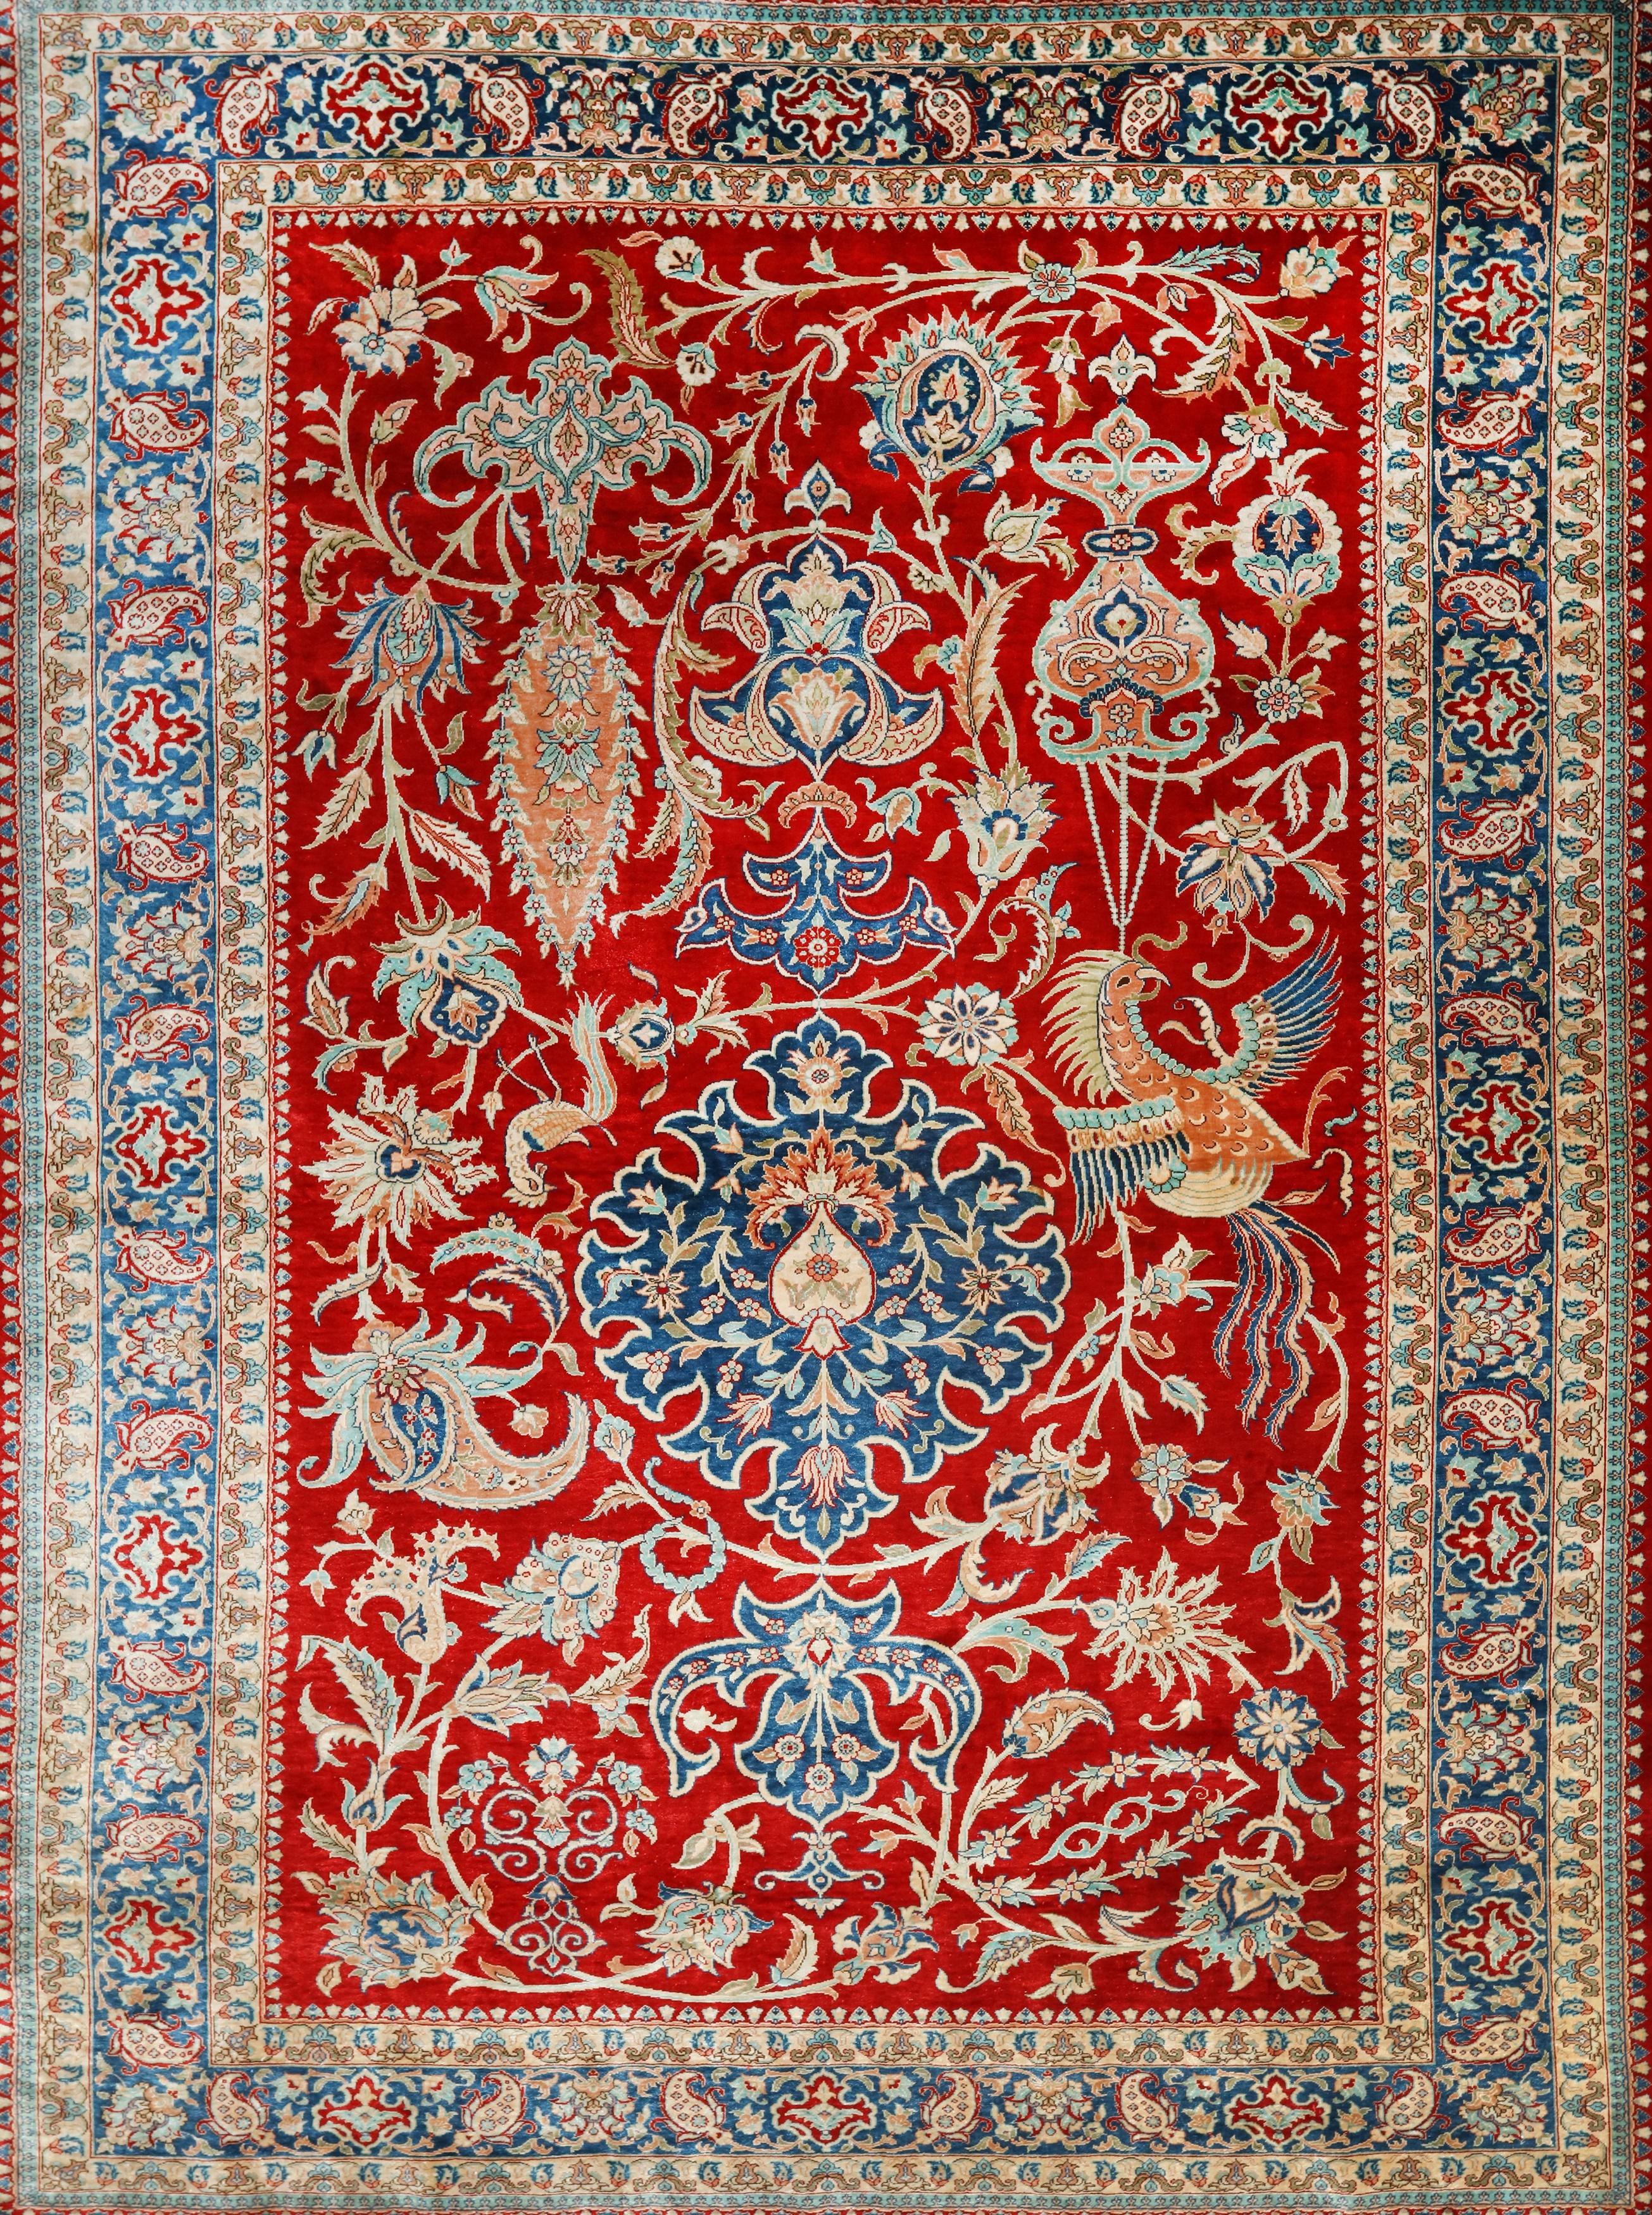 Fine Oriental Rugs & Carpets | Live Online